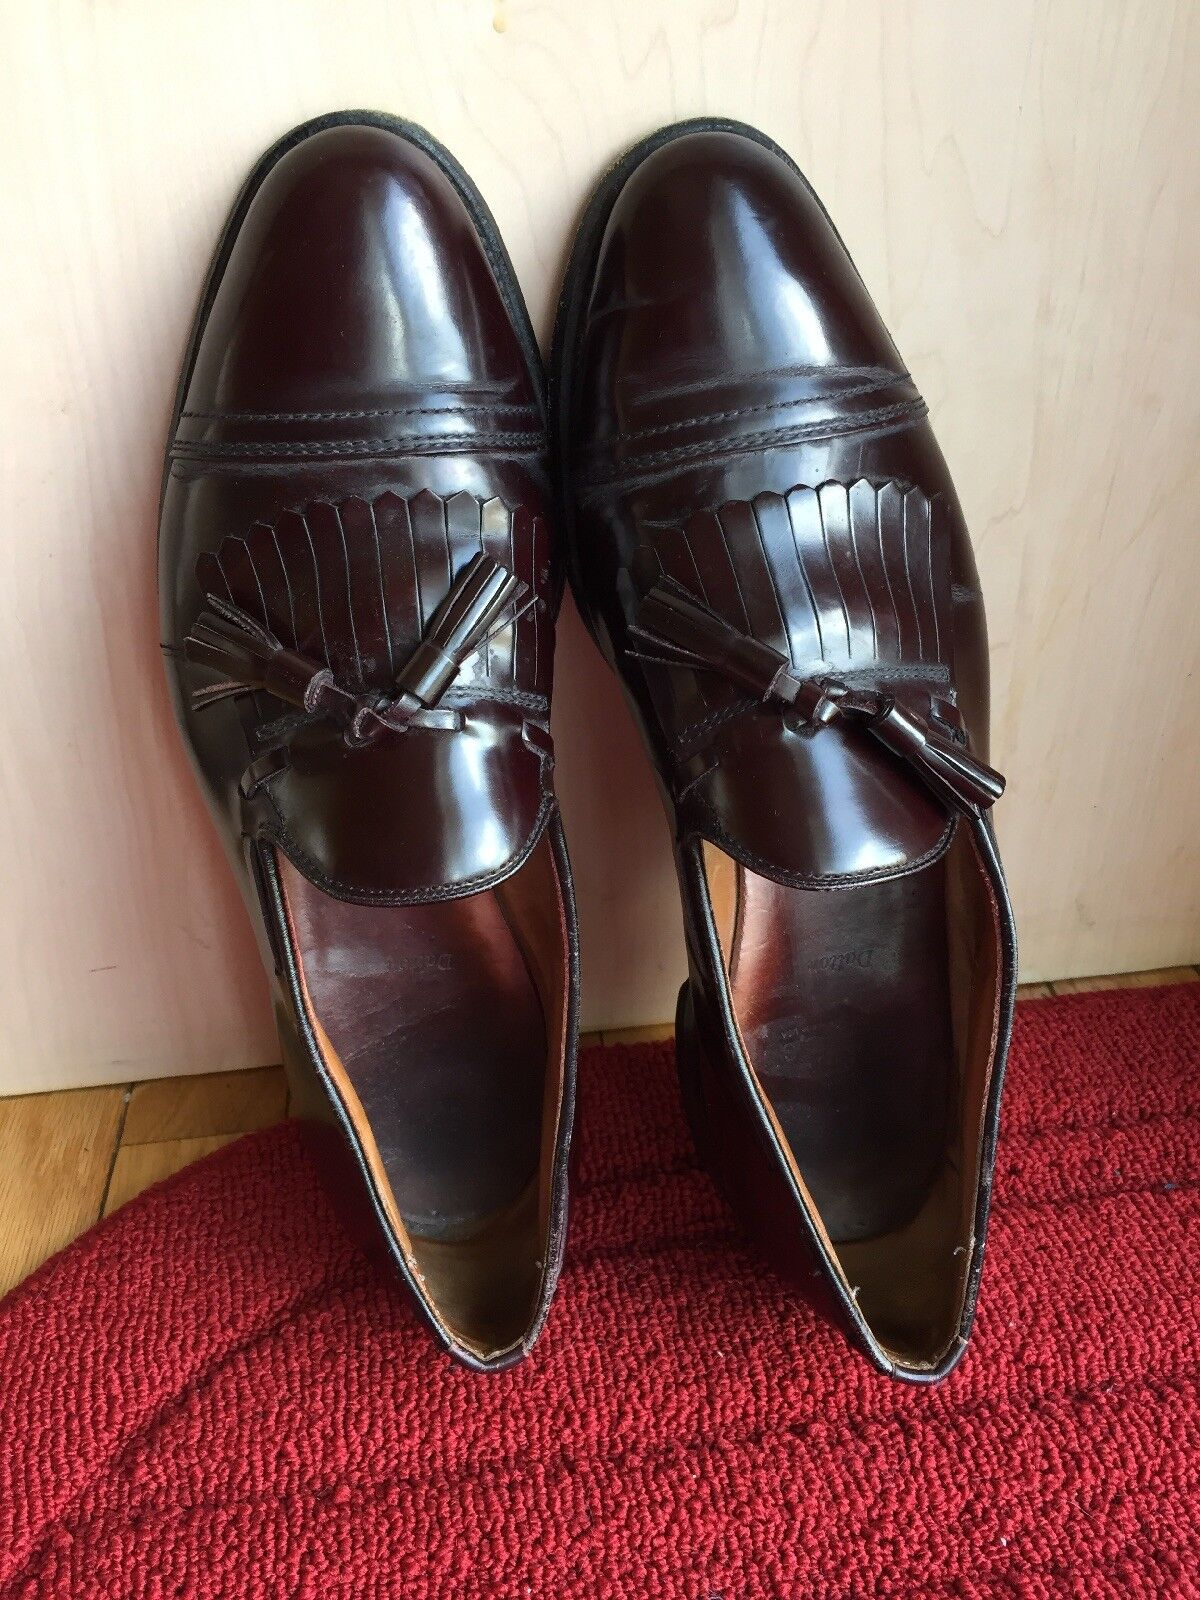 Allen Edmonds Dalton Sz 11.5 Tassel C Men's Burgundy Leather Tassel 11.5 Slip On Shoes EUC f07d08